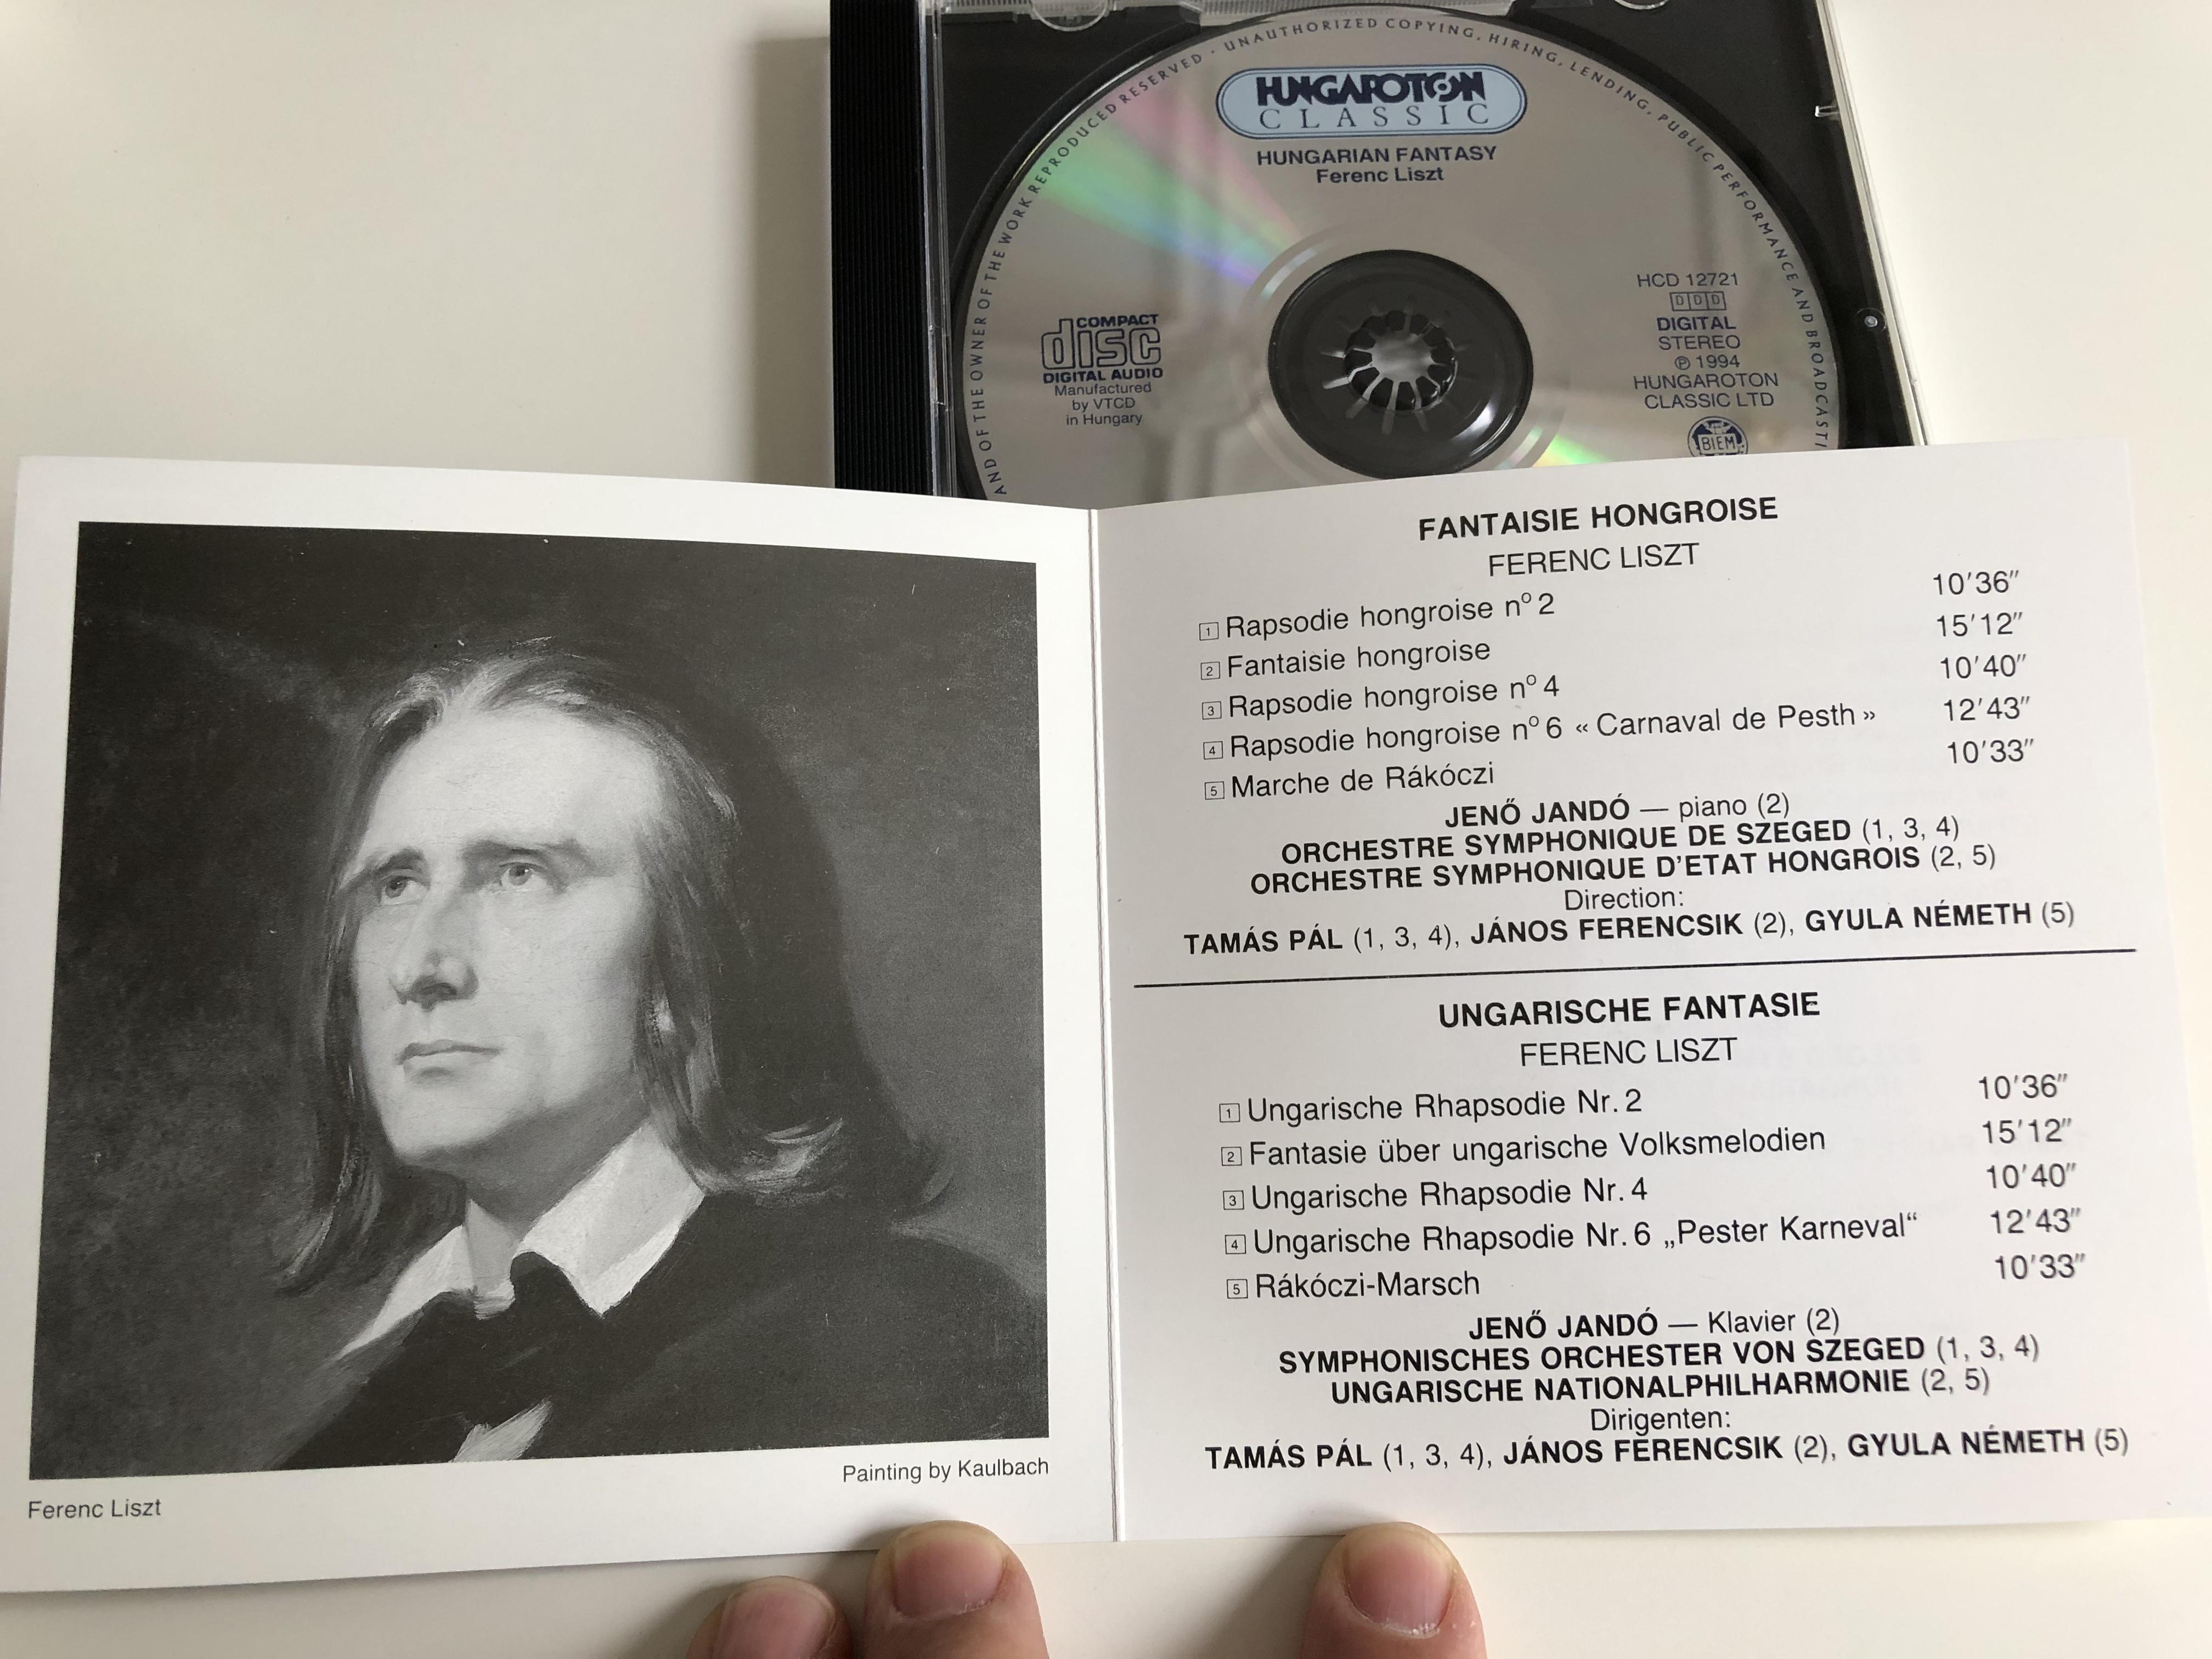 liszt-hungarian-fantasy-orchestral-favourites-szeged-symphony-orchestra-hungarian-state-orchestra-jen-jand-piano-2-.jpg